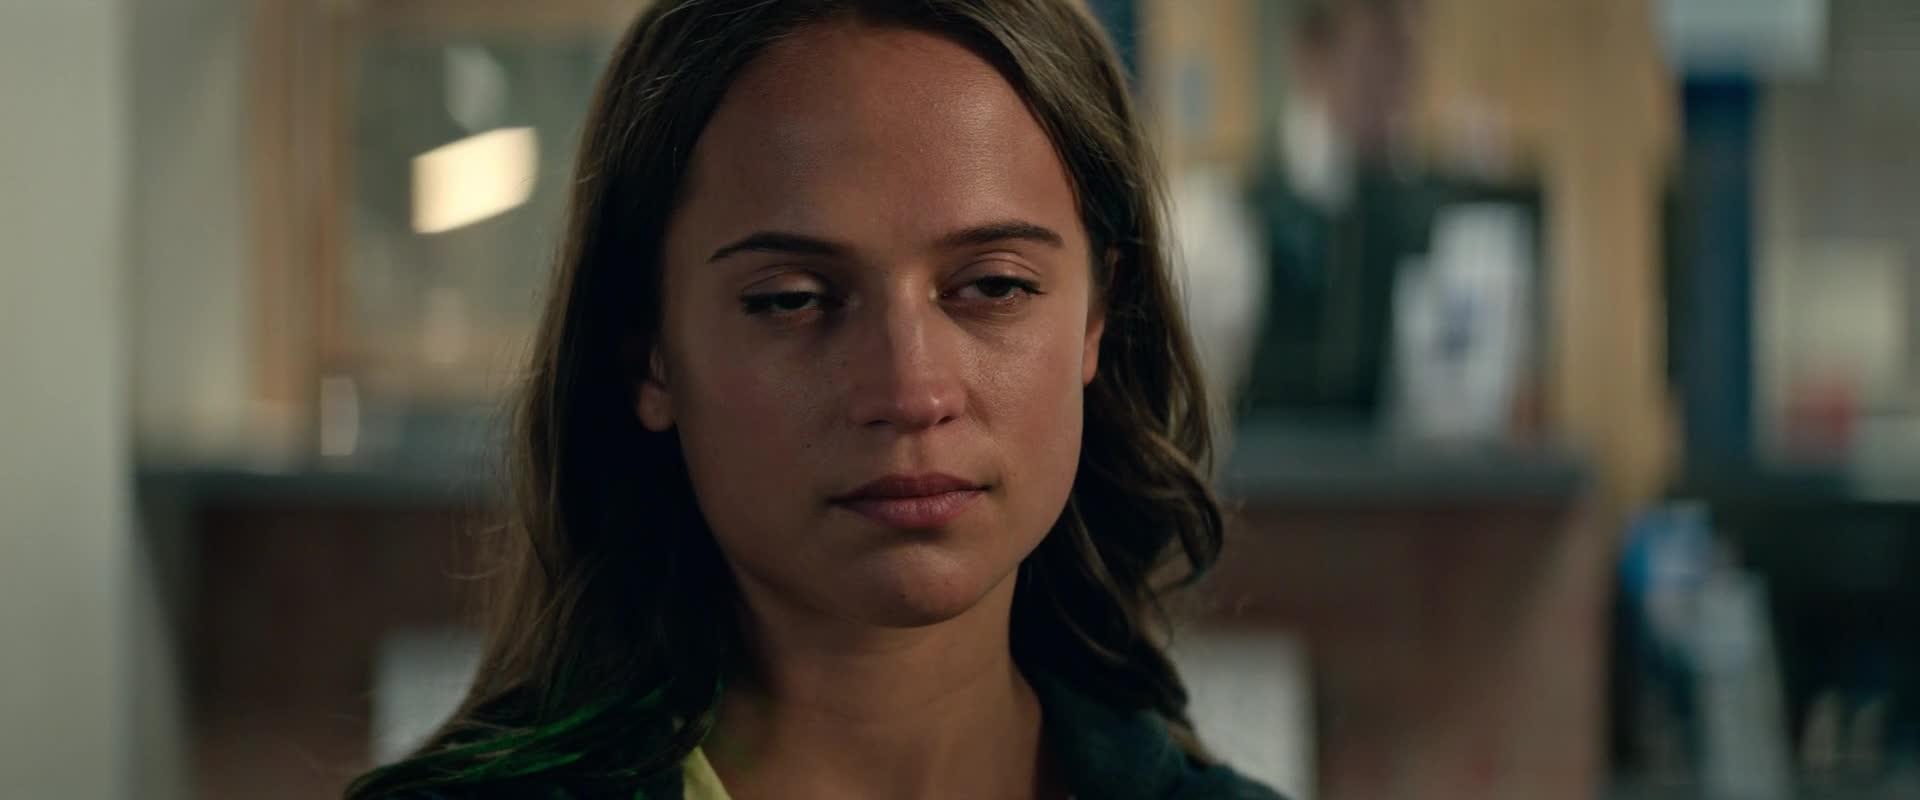 Tomb Raider   akcni 2018   cz dabing